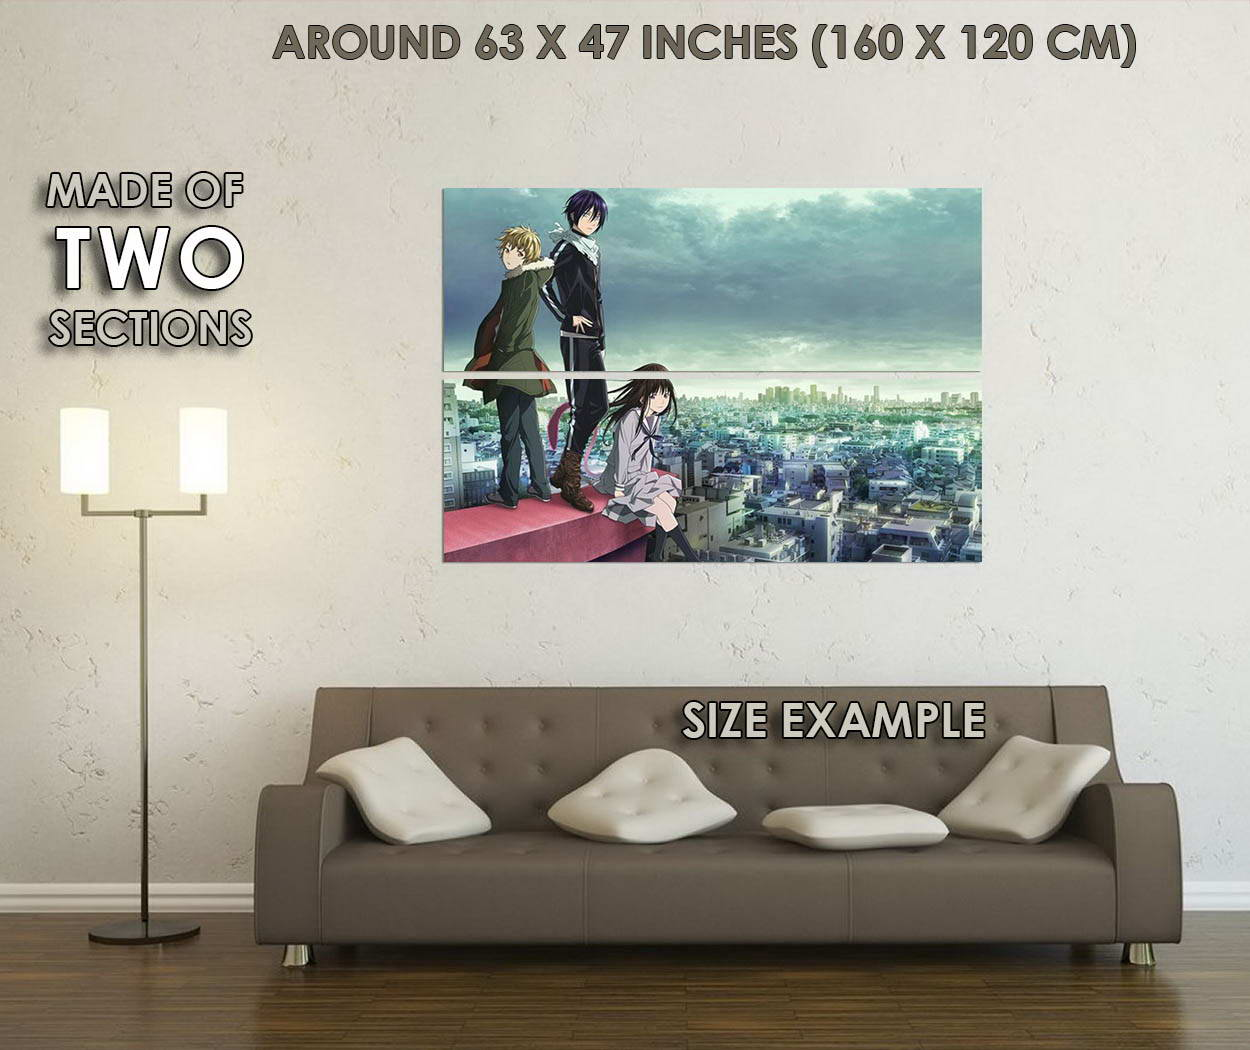 10791-Iki-Hiyori-Noragami-Anime-LAMINATED-POSTER-CA thumbnail 6